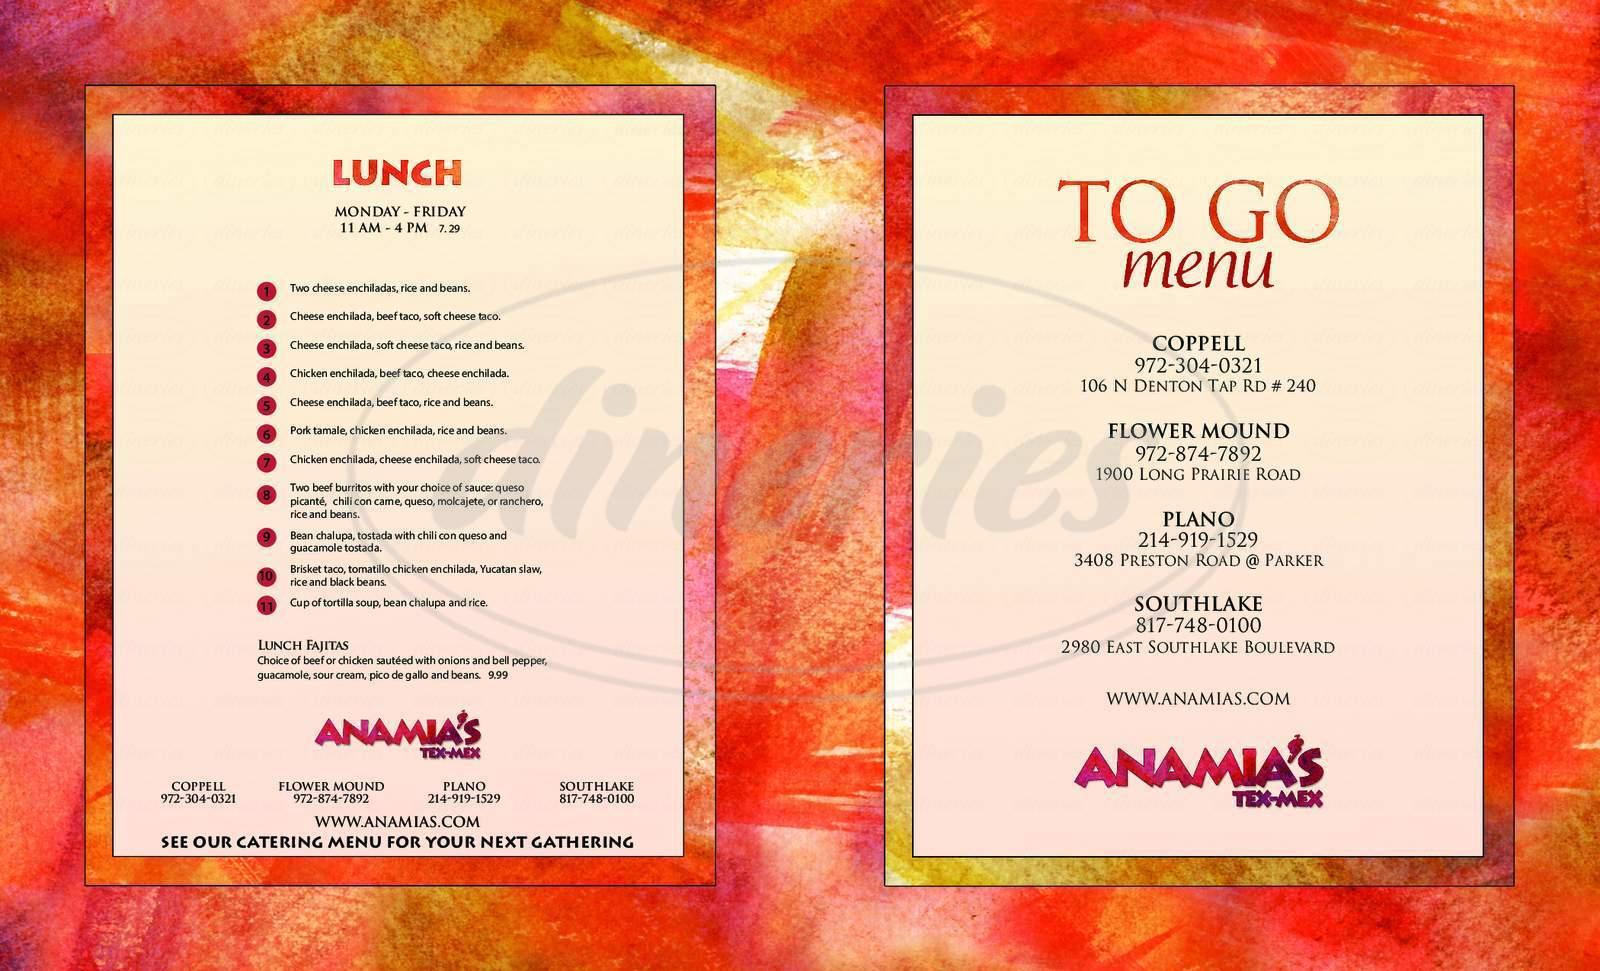 menu for Anamia's